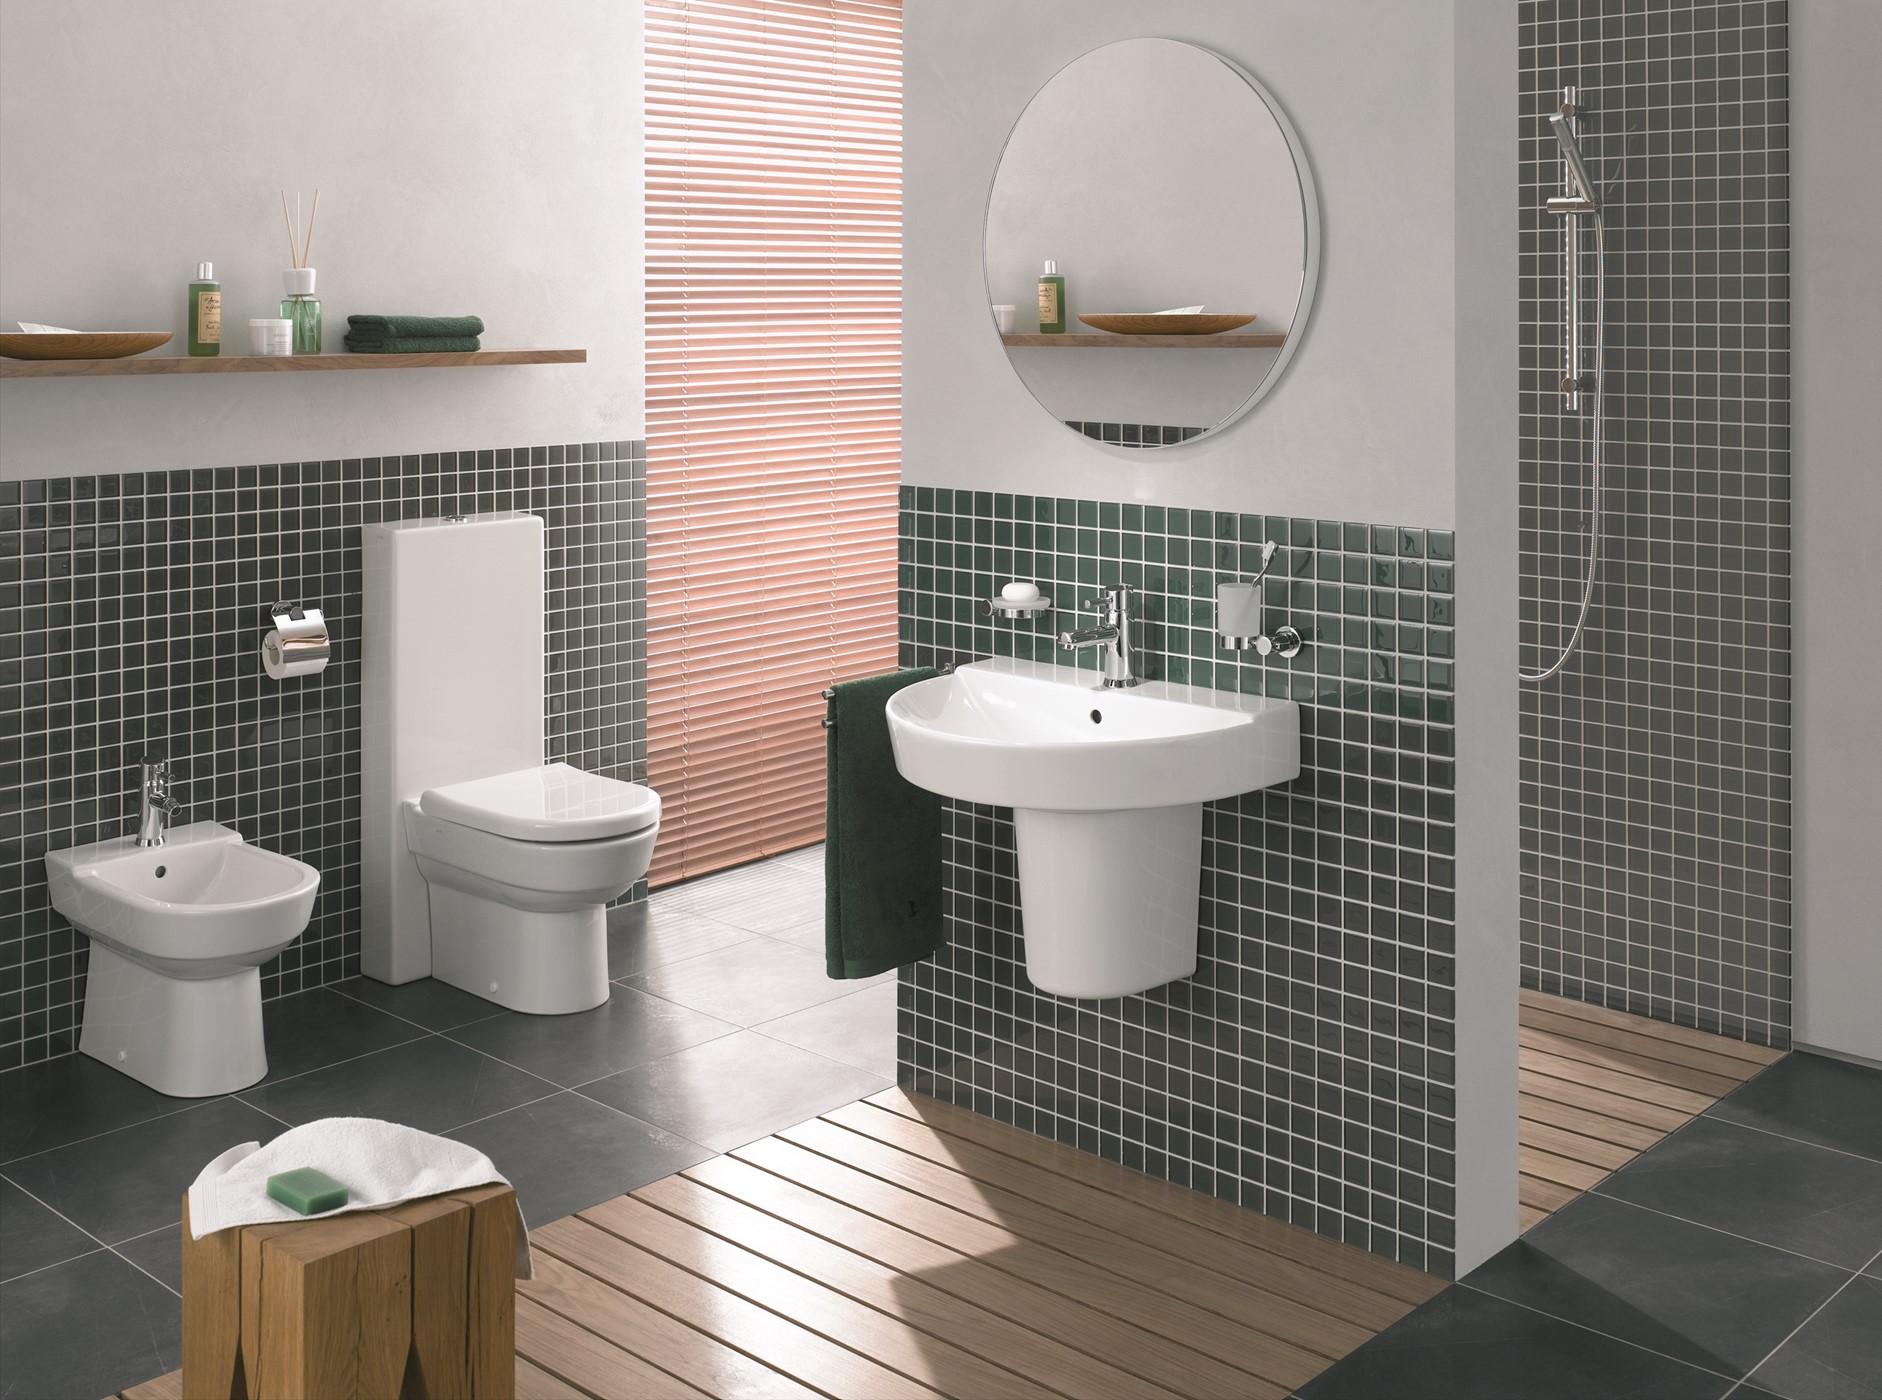 Step Bathroom Suite range from Vitra